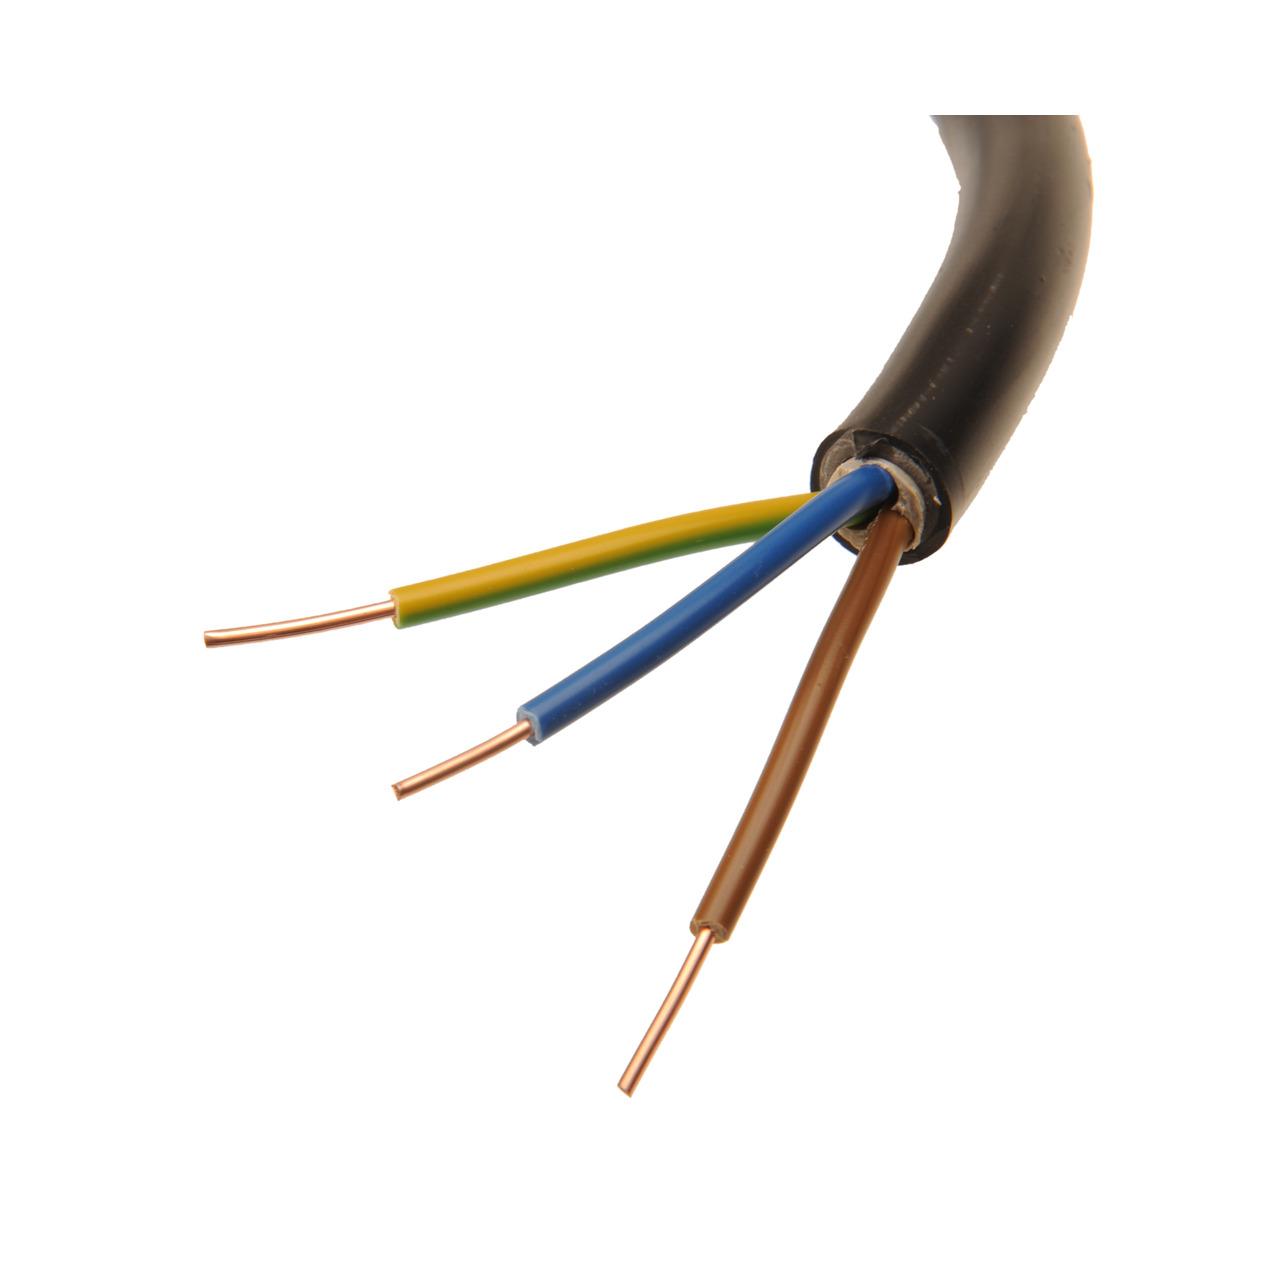 BKL Electronic NYY-J 3x 1-5 mm- Erdkabel- schwarz- 20 m